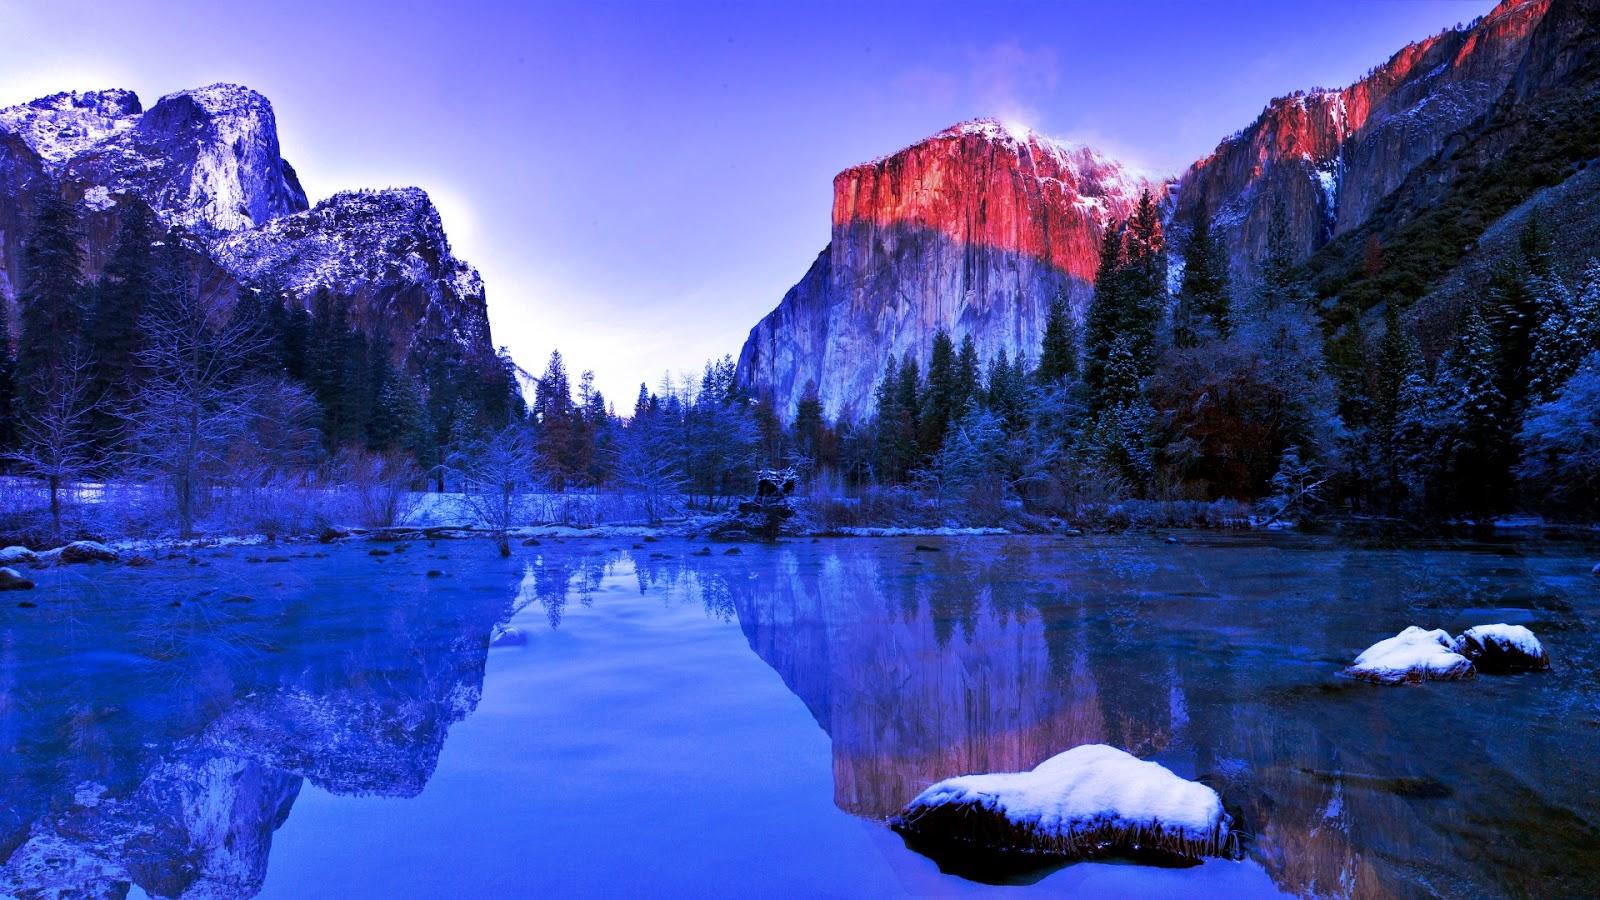 Yosemite lake in winter